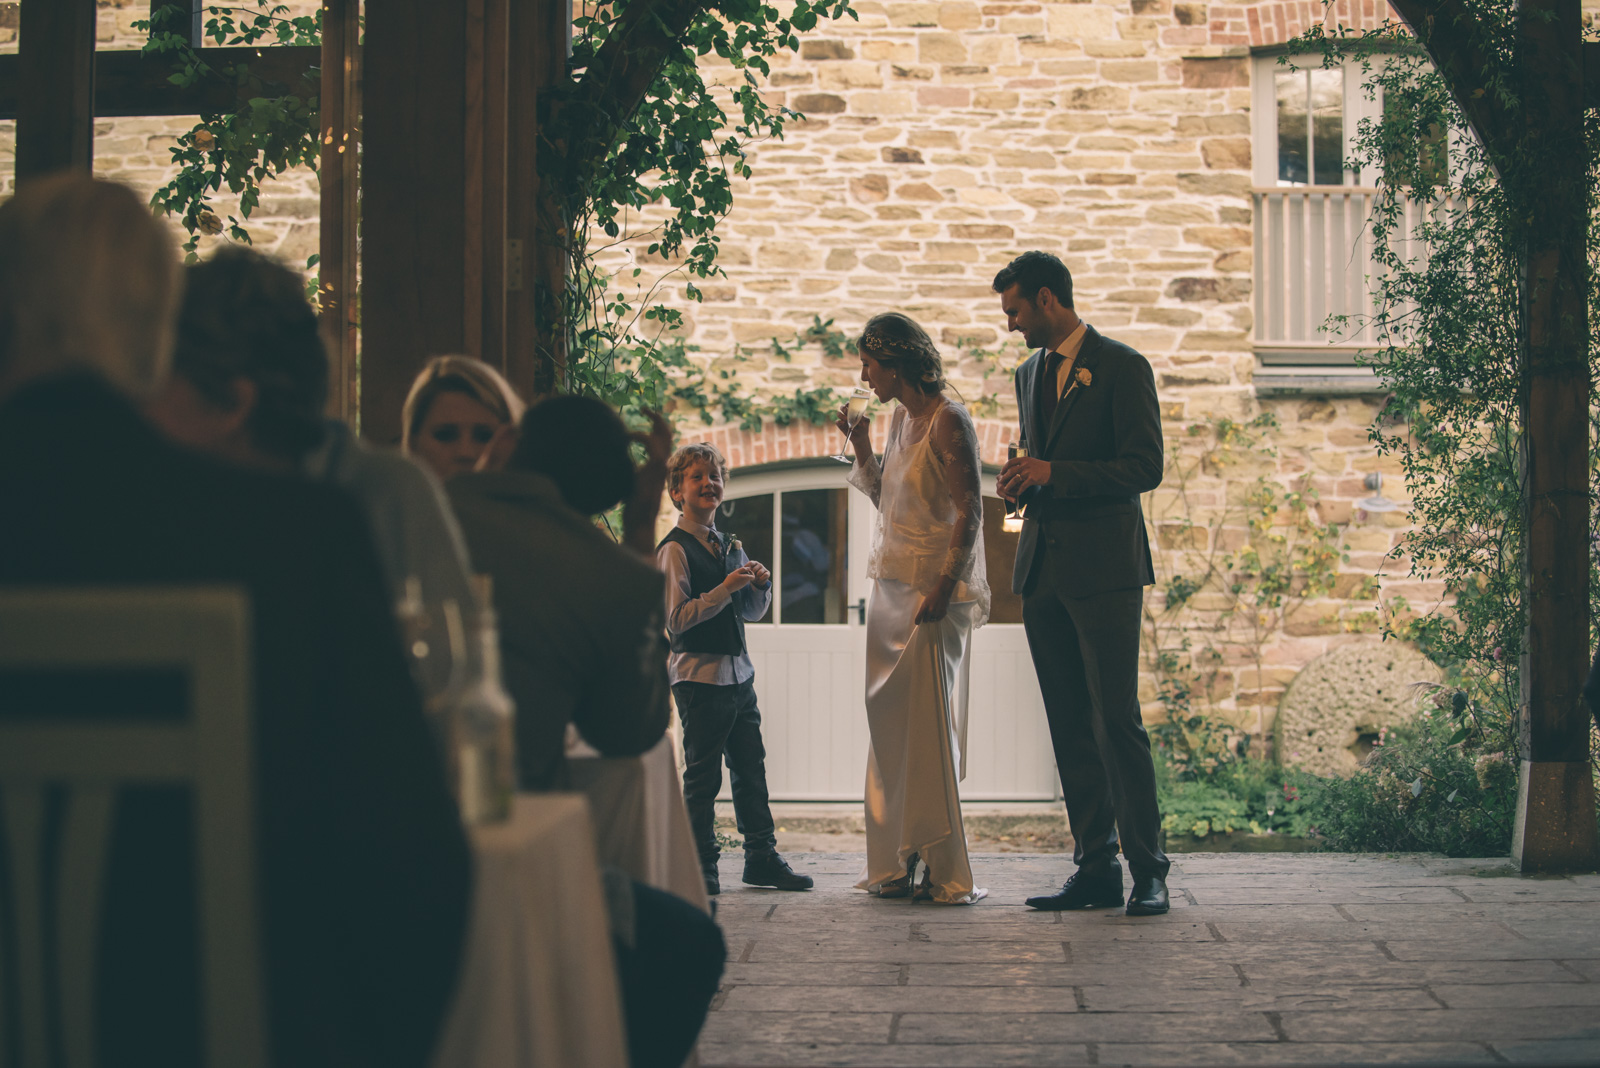 nancarrow-wedding-photography-118.jpg